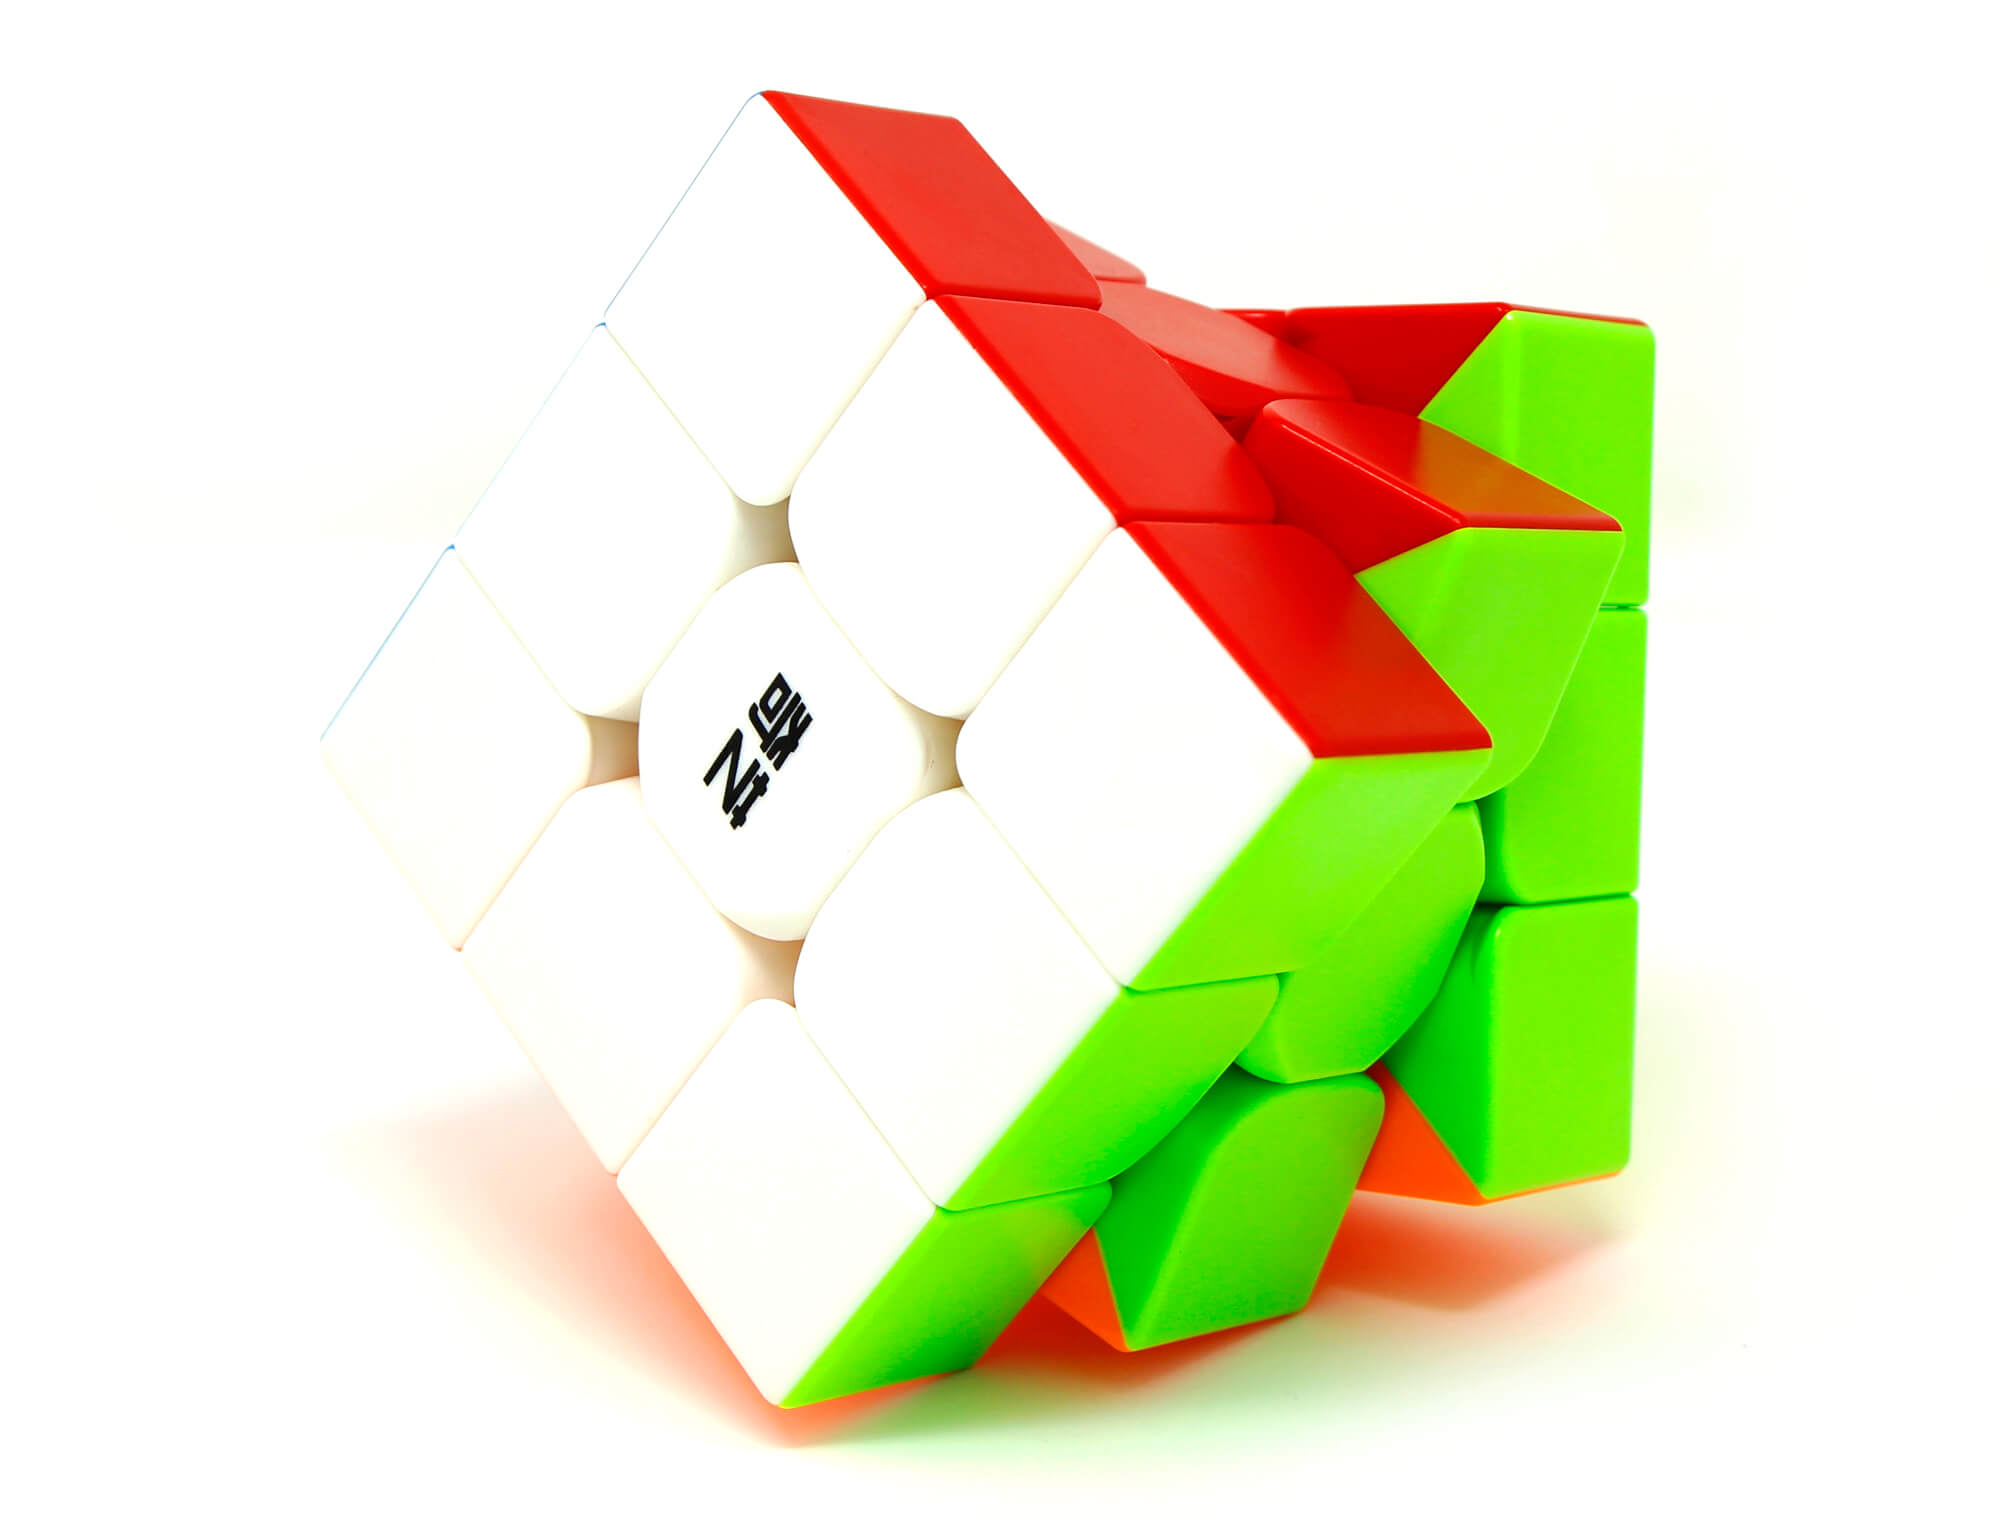 3X3X3 QIMENG PLUS - CUBO GIGANTE